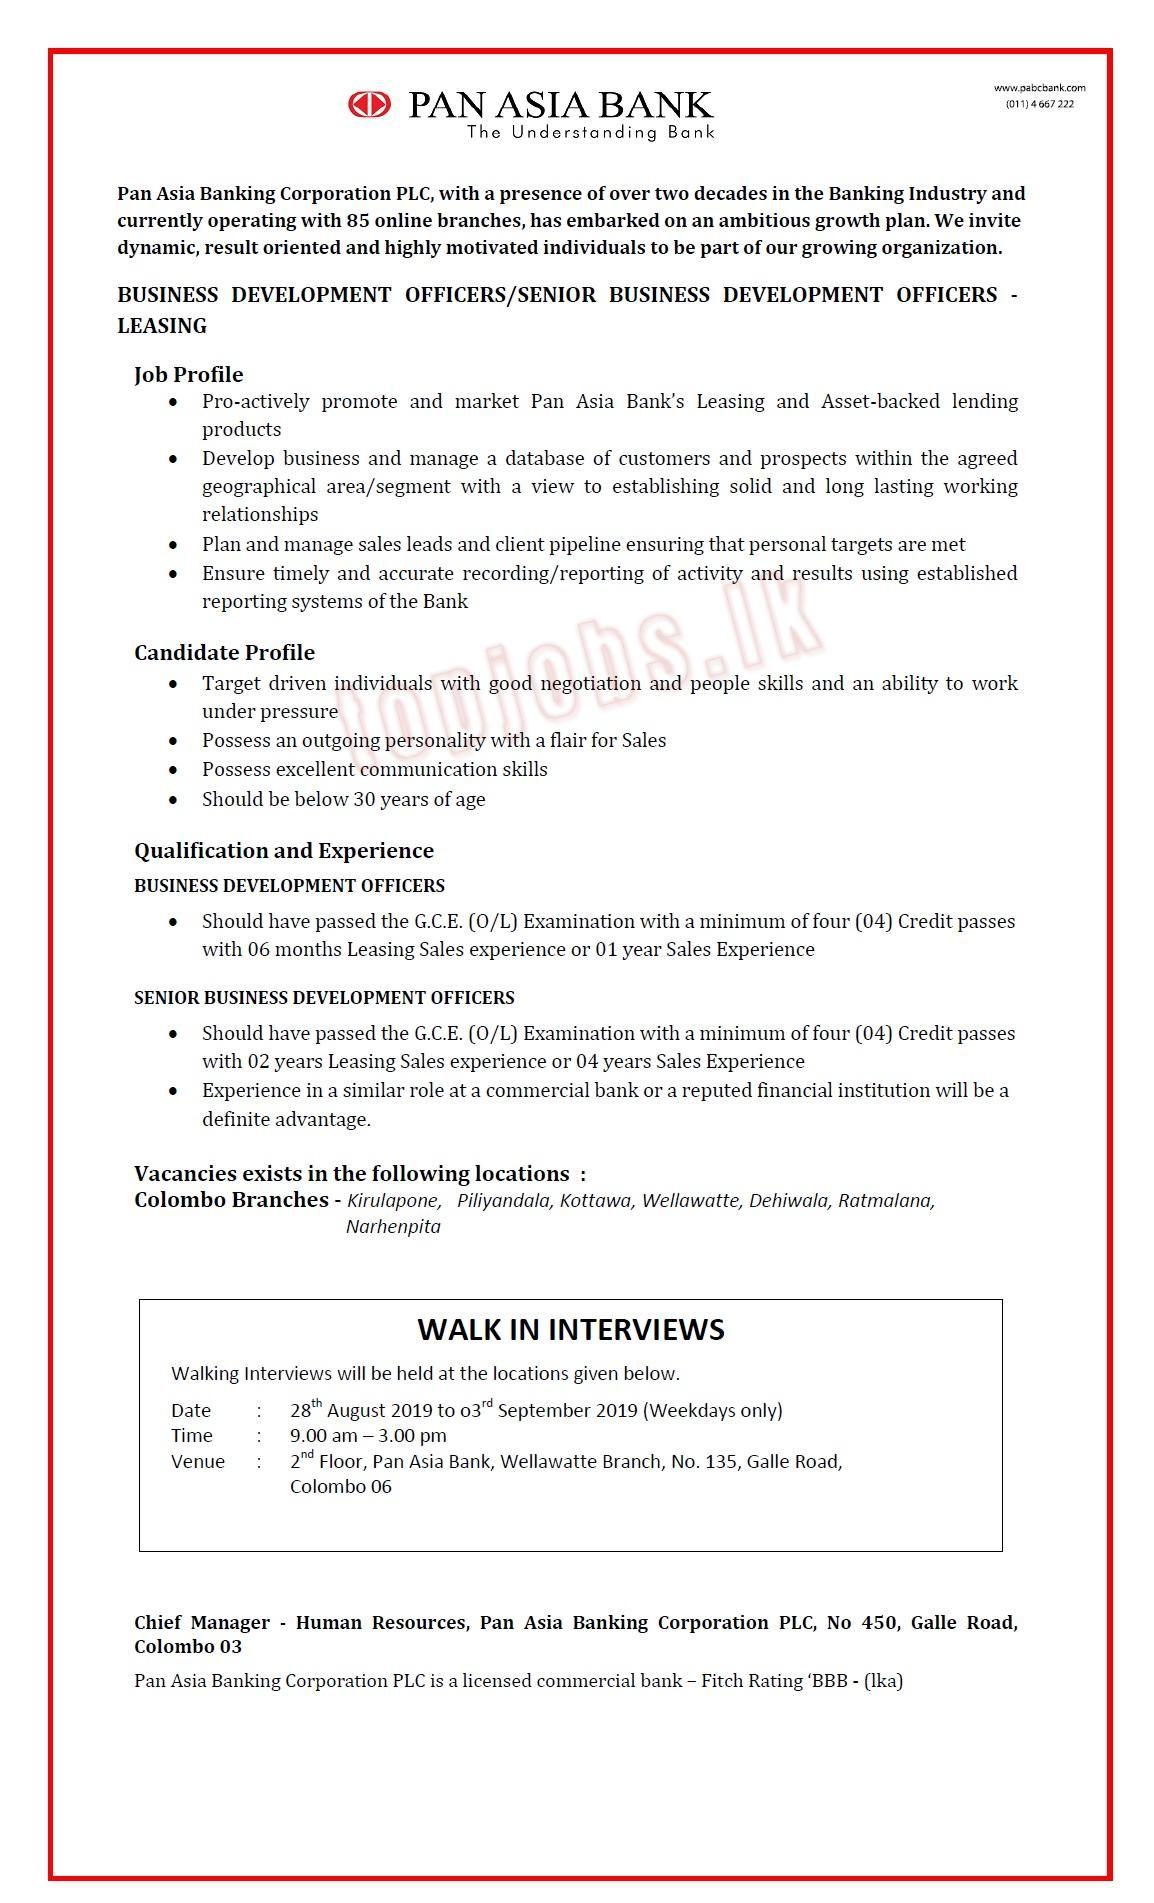 Business Development Officer Job Vacancy at Pan Asia Bank